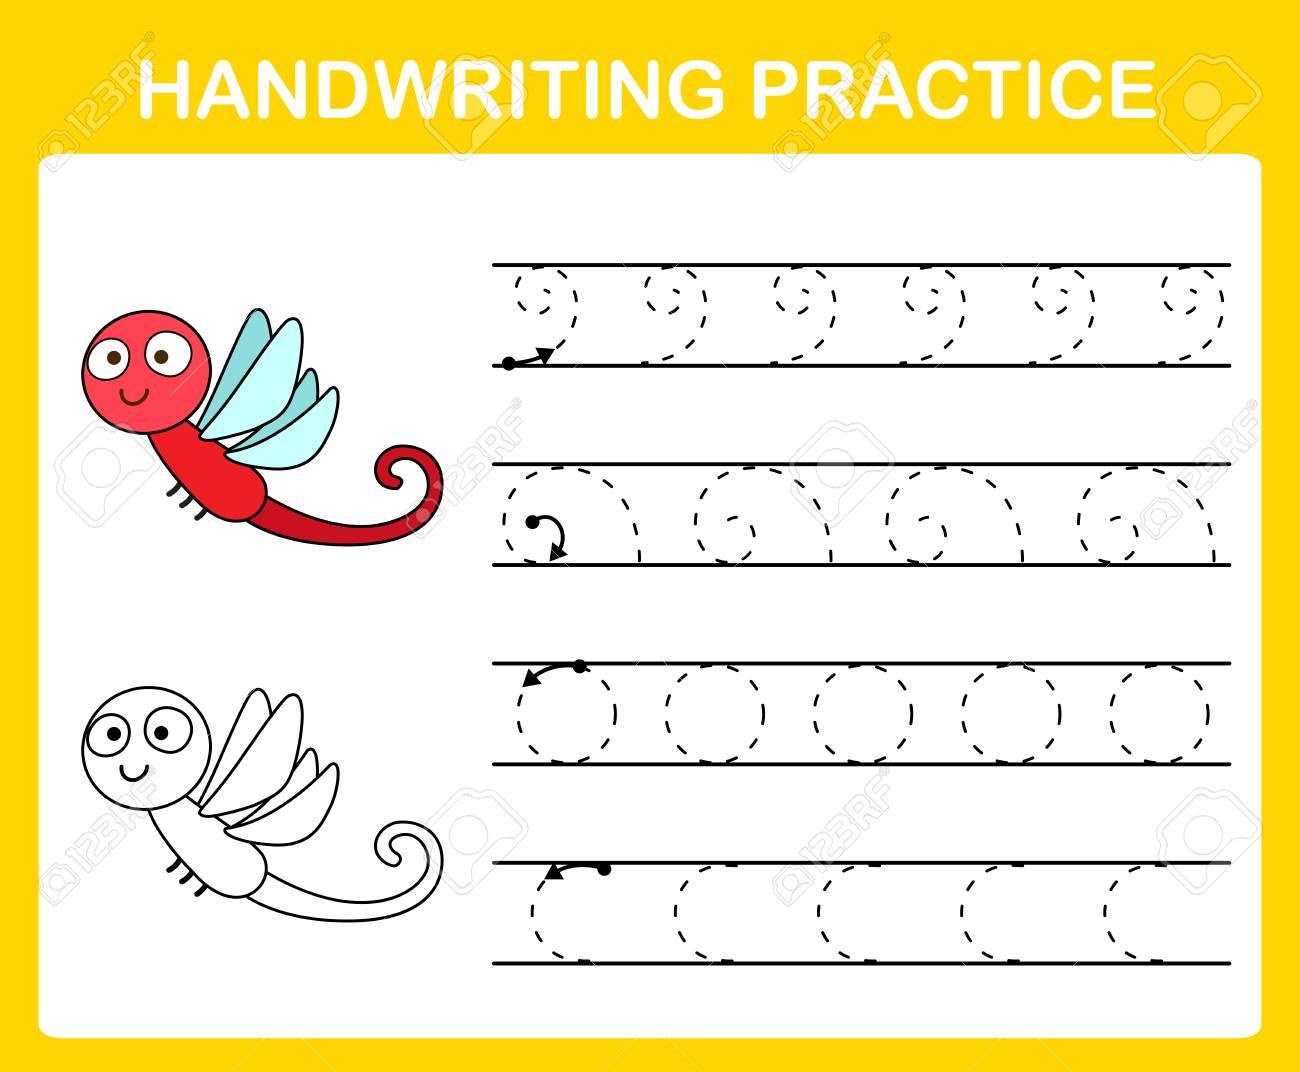 Handwriting practice sheet illustration vector - 105391302